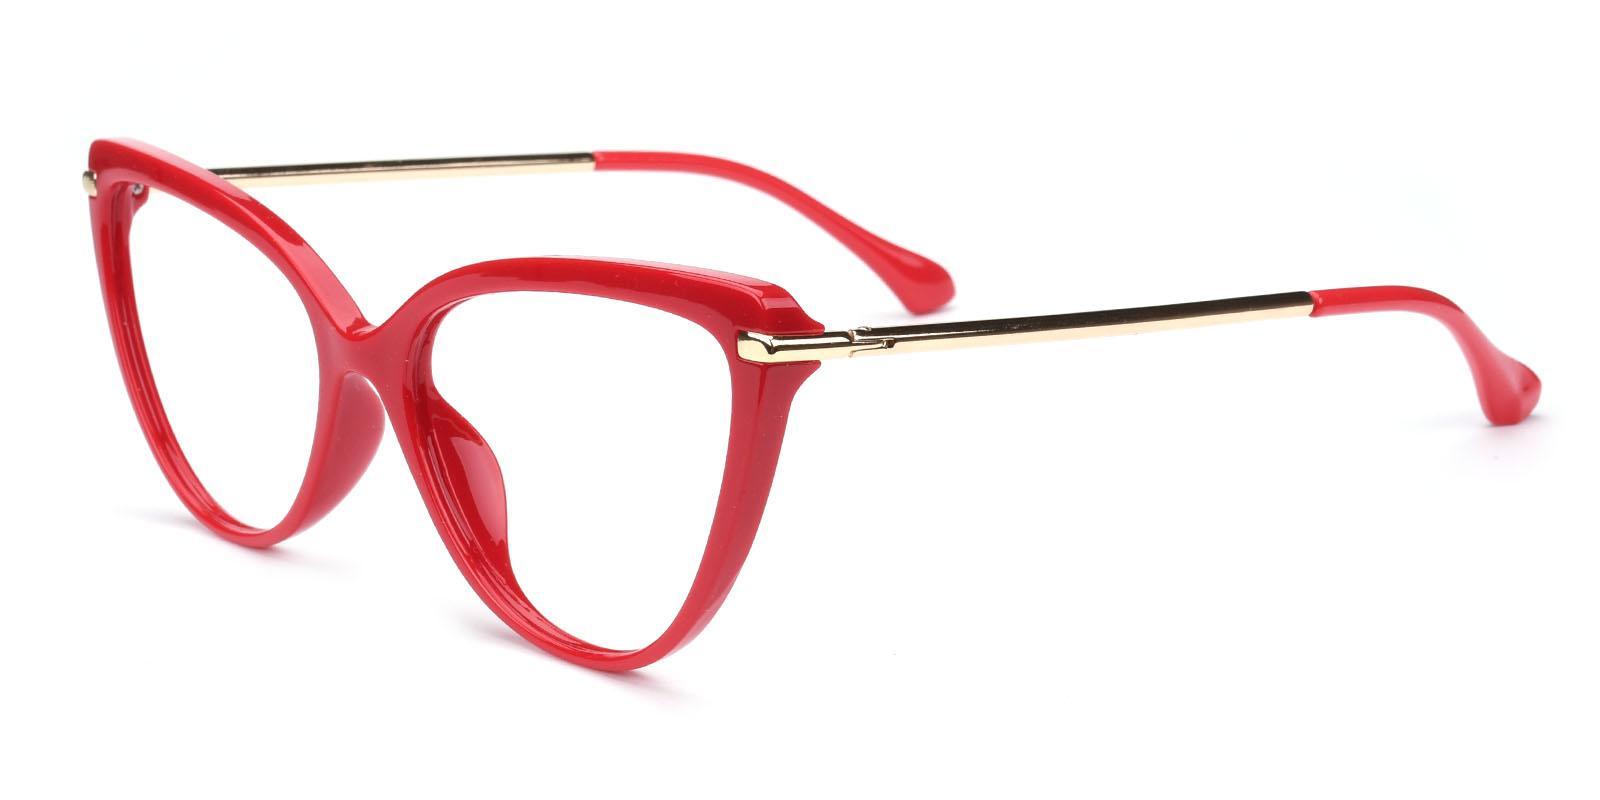 Doris-Red-Cat-Combination-Eyeglasses-additional1